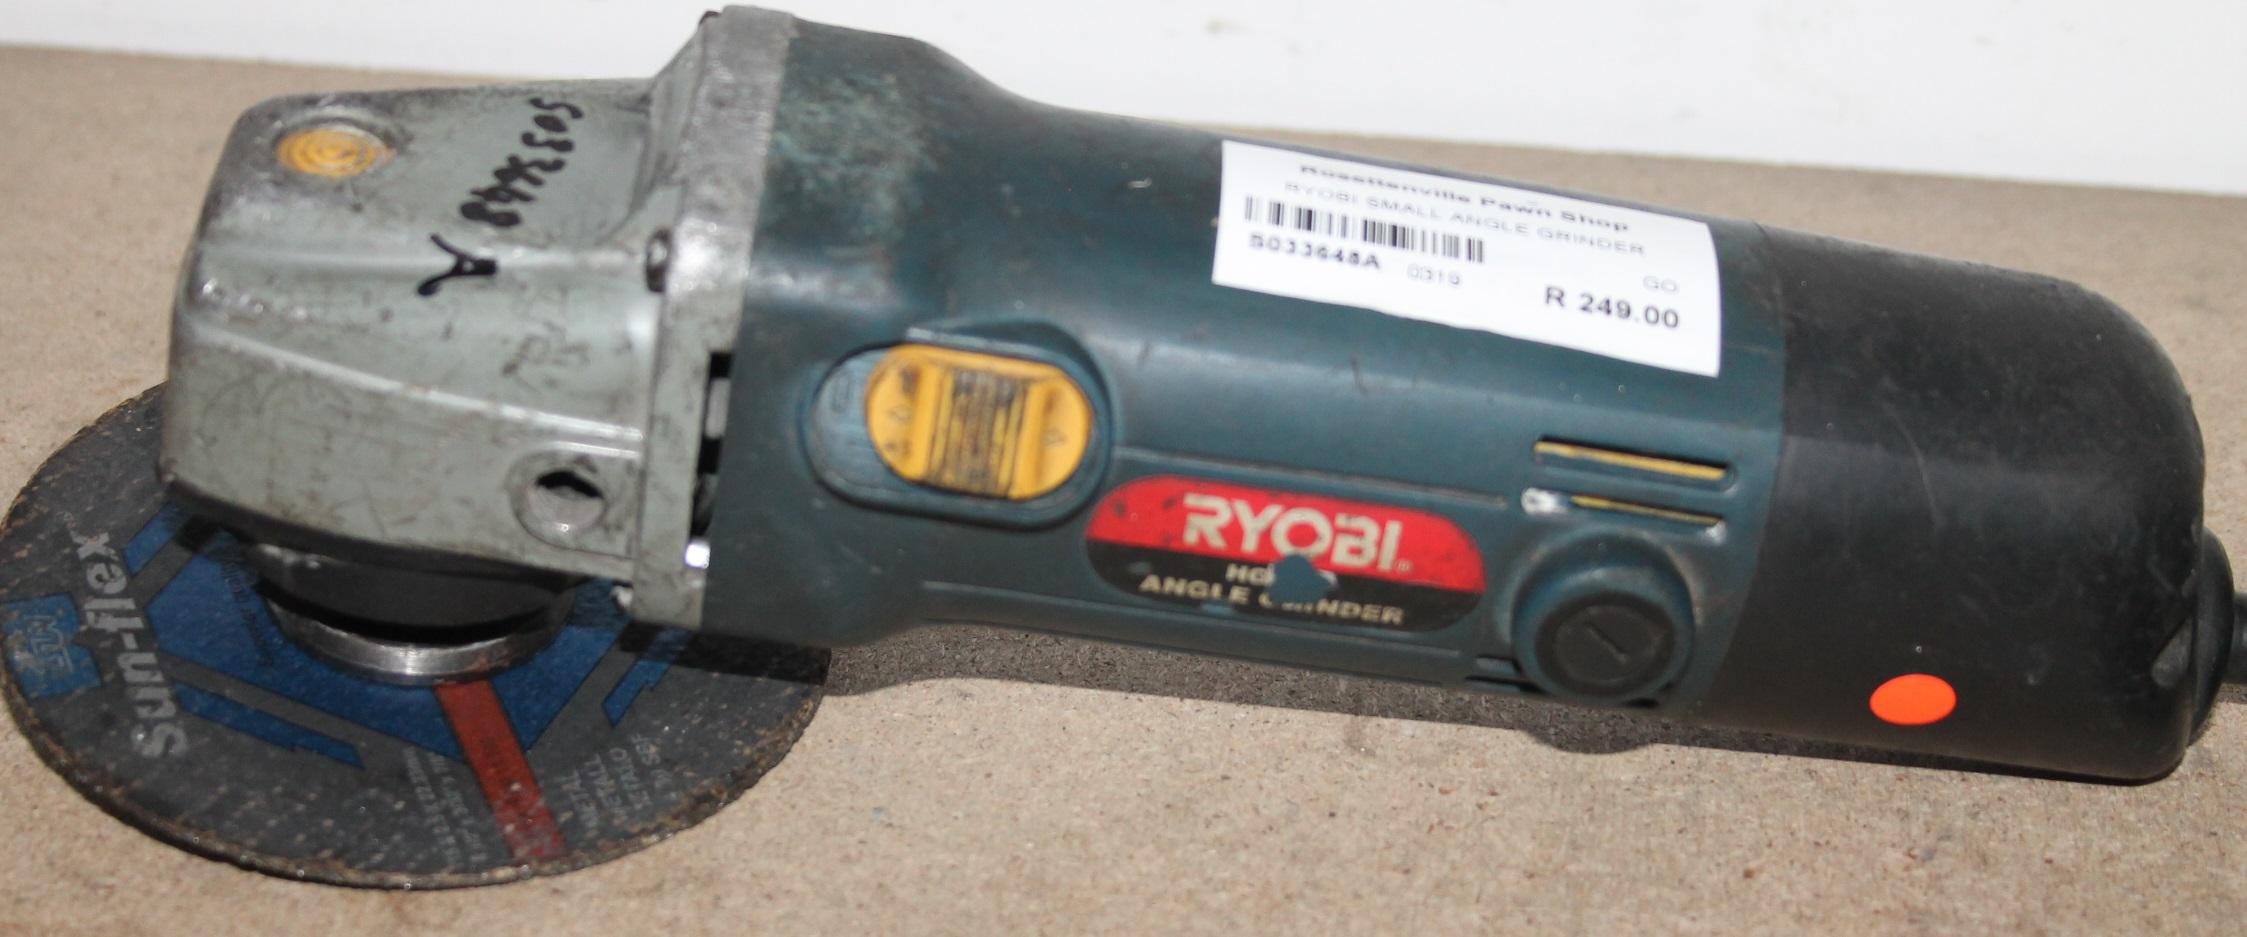 Ryobi angle grinder S033648A #Rosettenvillepawnshop